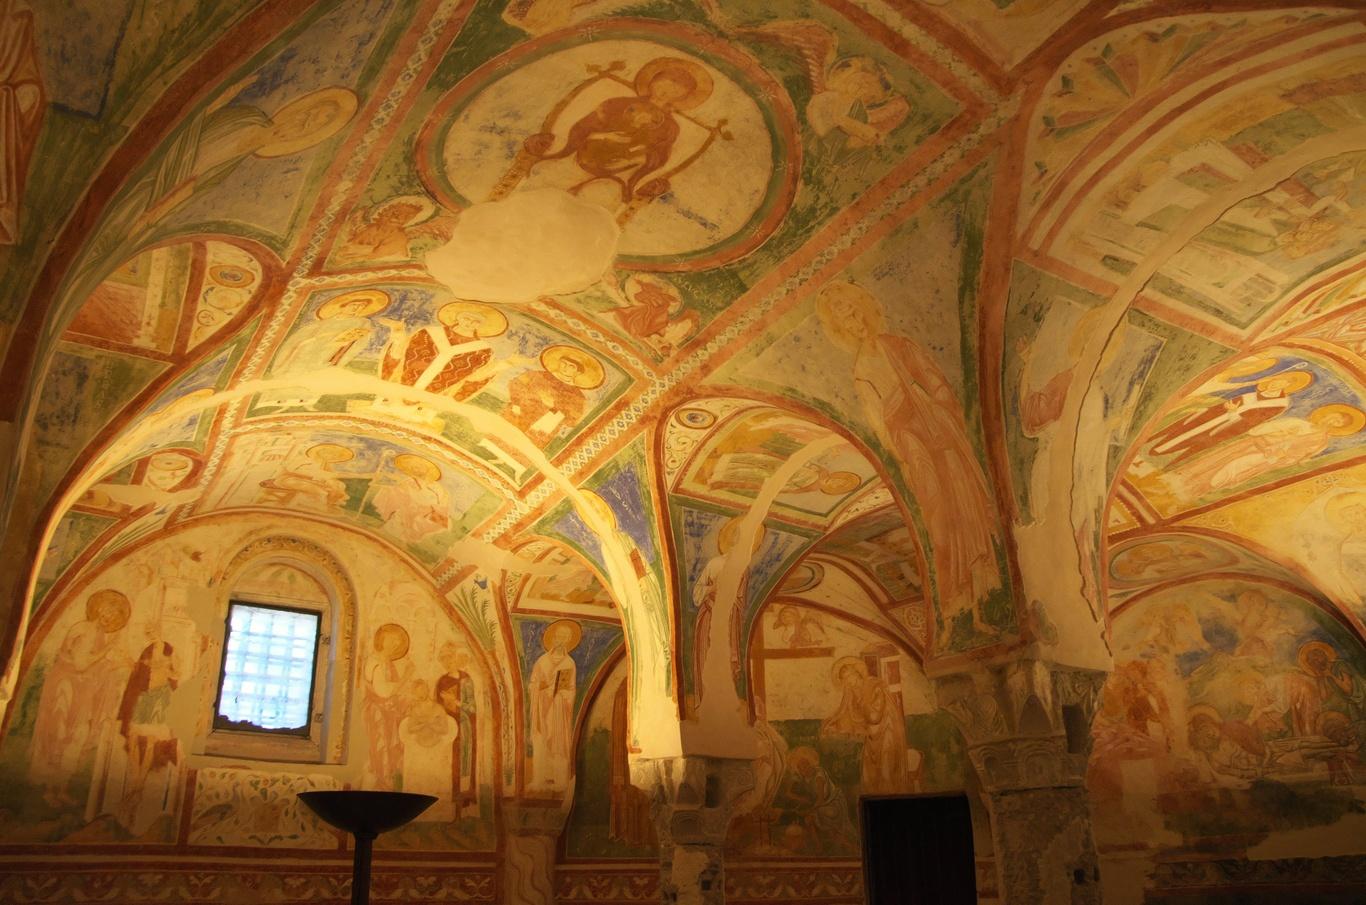 Aquileia, bazilika - krypta s freskami z 12. století (La Cripta degli affreschi)